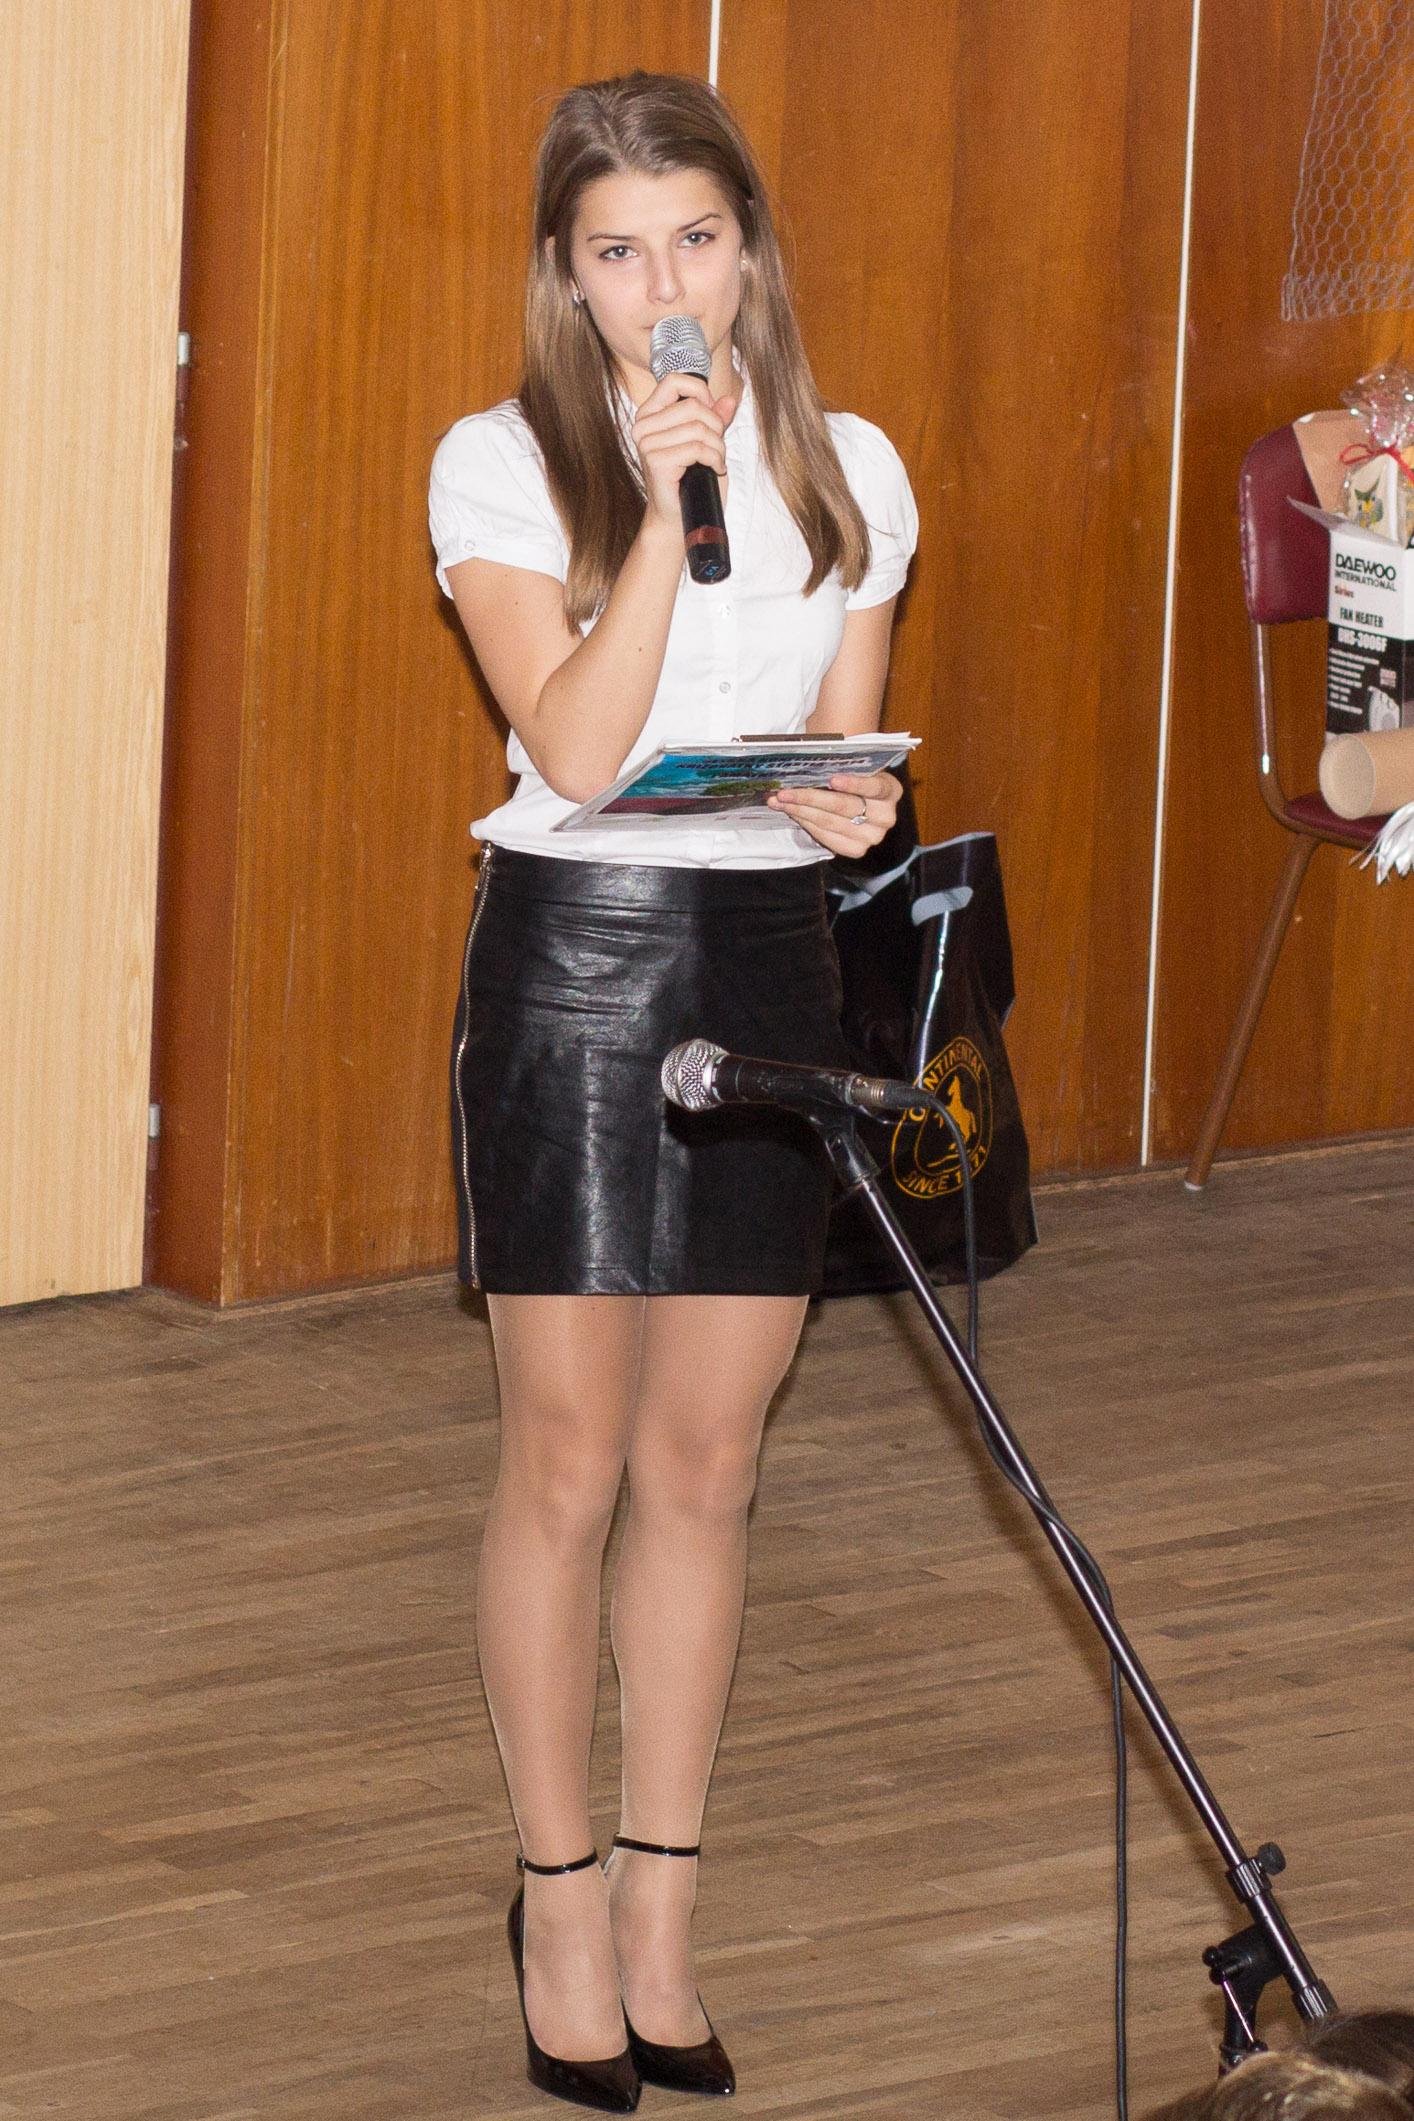 alica-krnacova-konferencia-2014